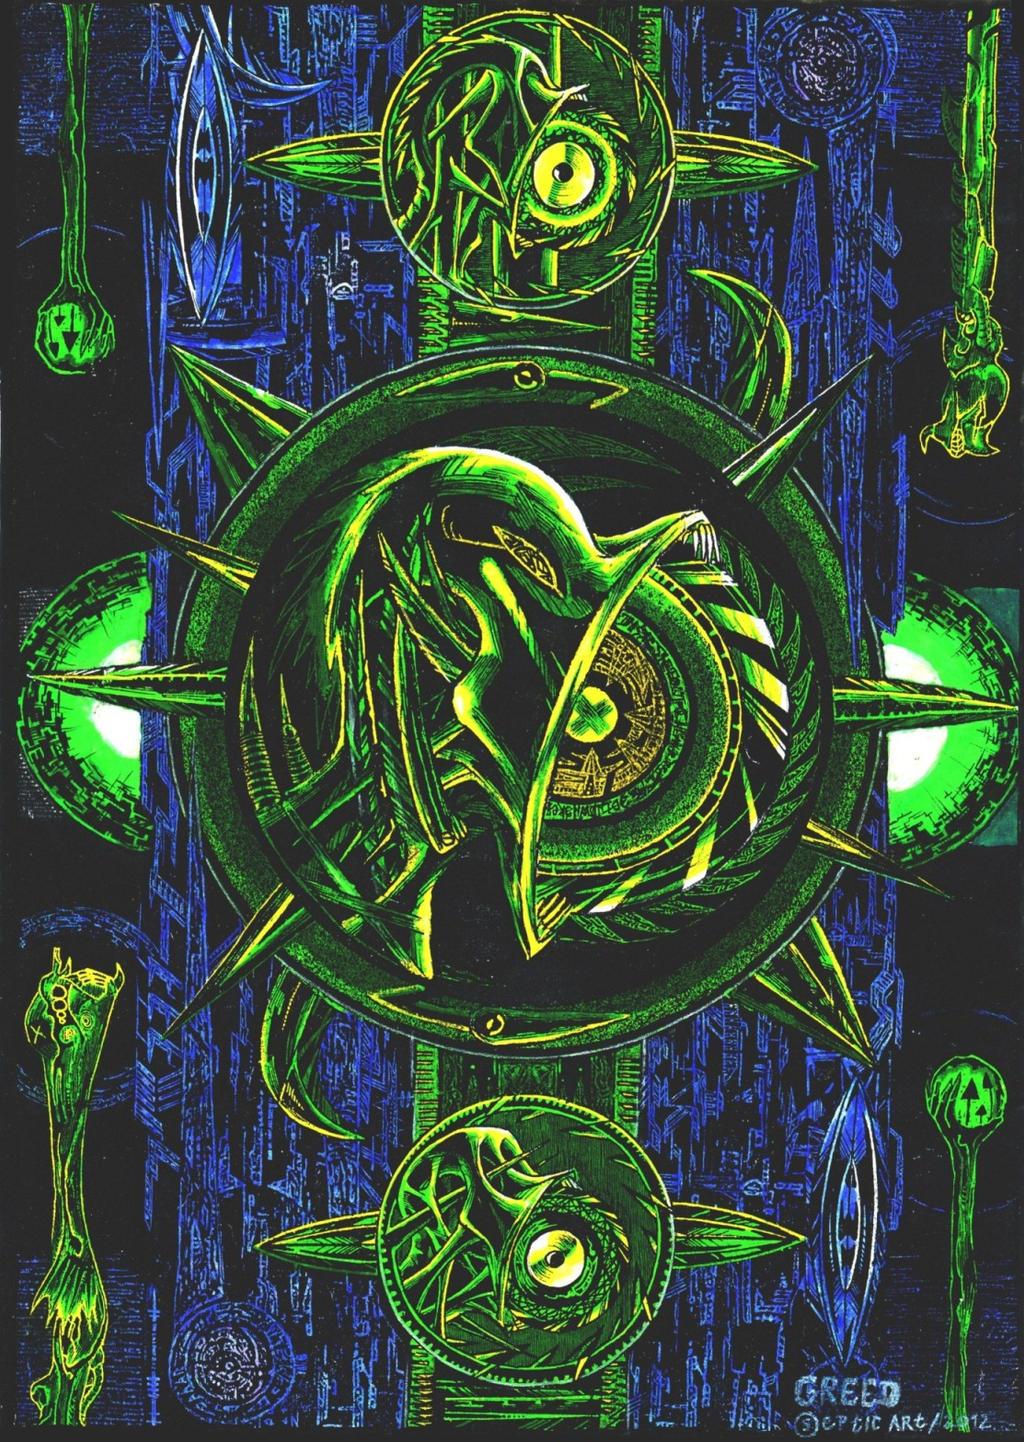 127.GREED -Septic Art 2012